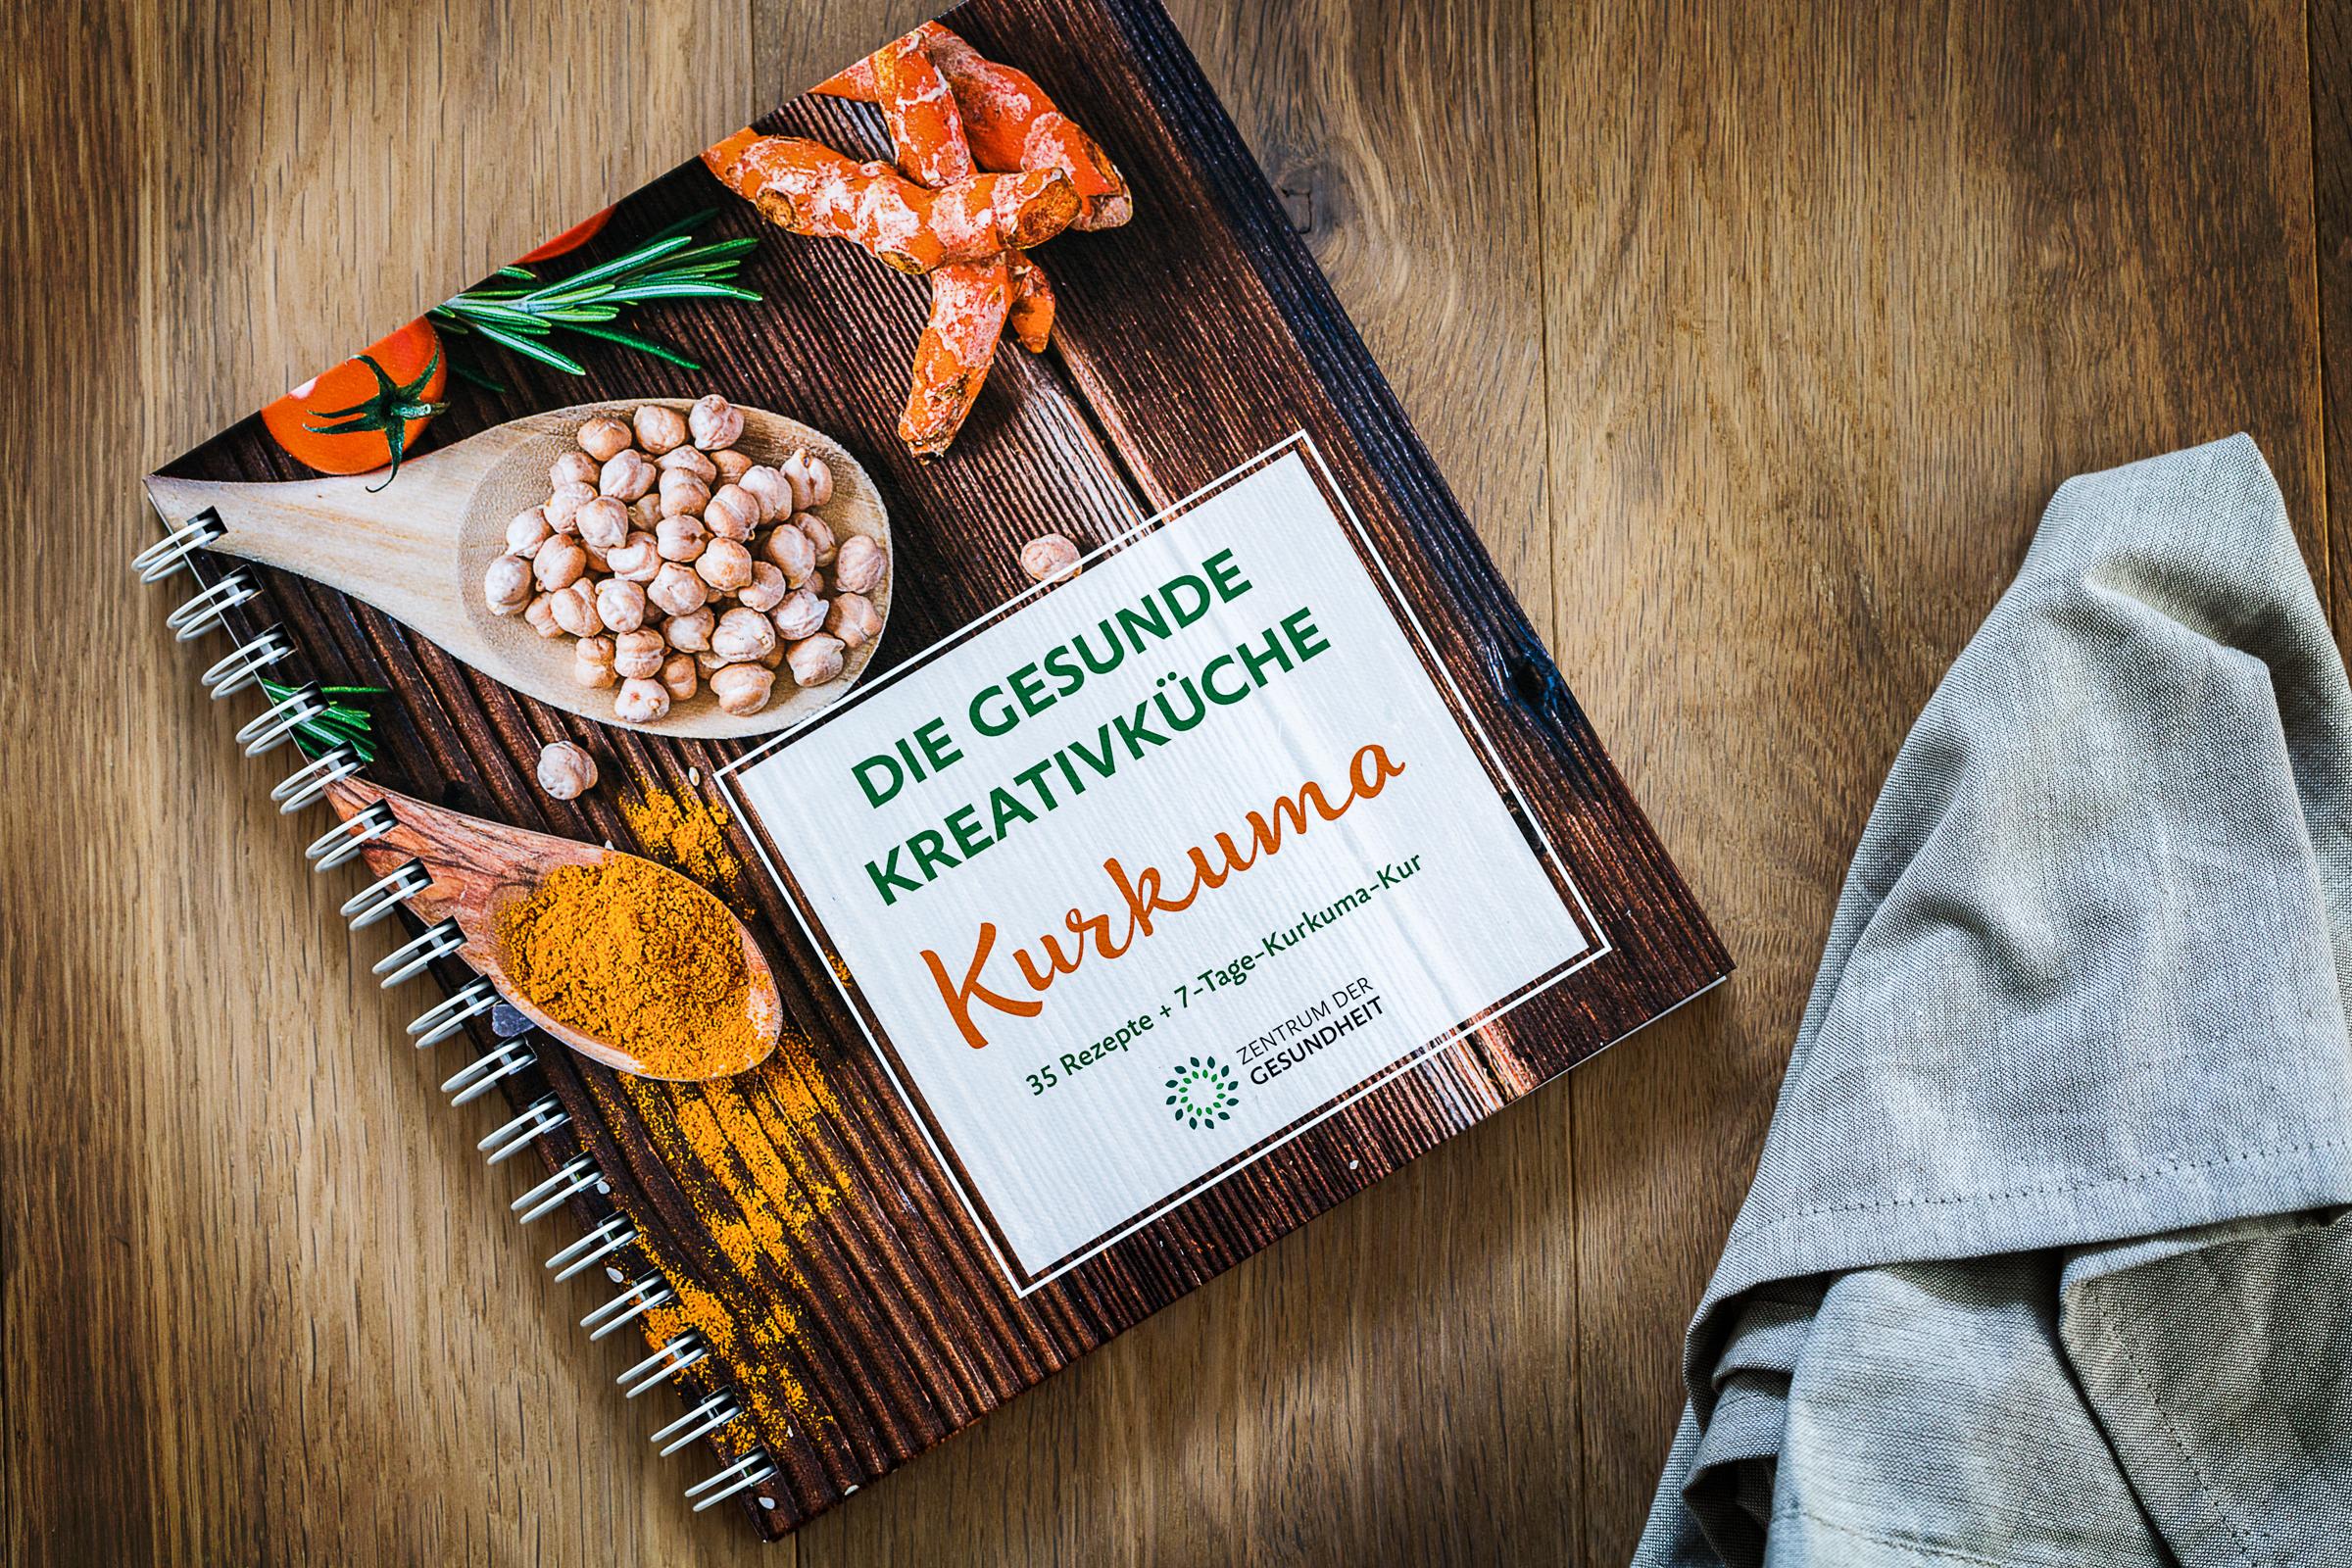 KURKUMA KOCHBUCH    KLIENT:   NEOSMART CONSULTING AG, LUZERN   FOOD-STYLING:   MATTHIS BADER